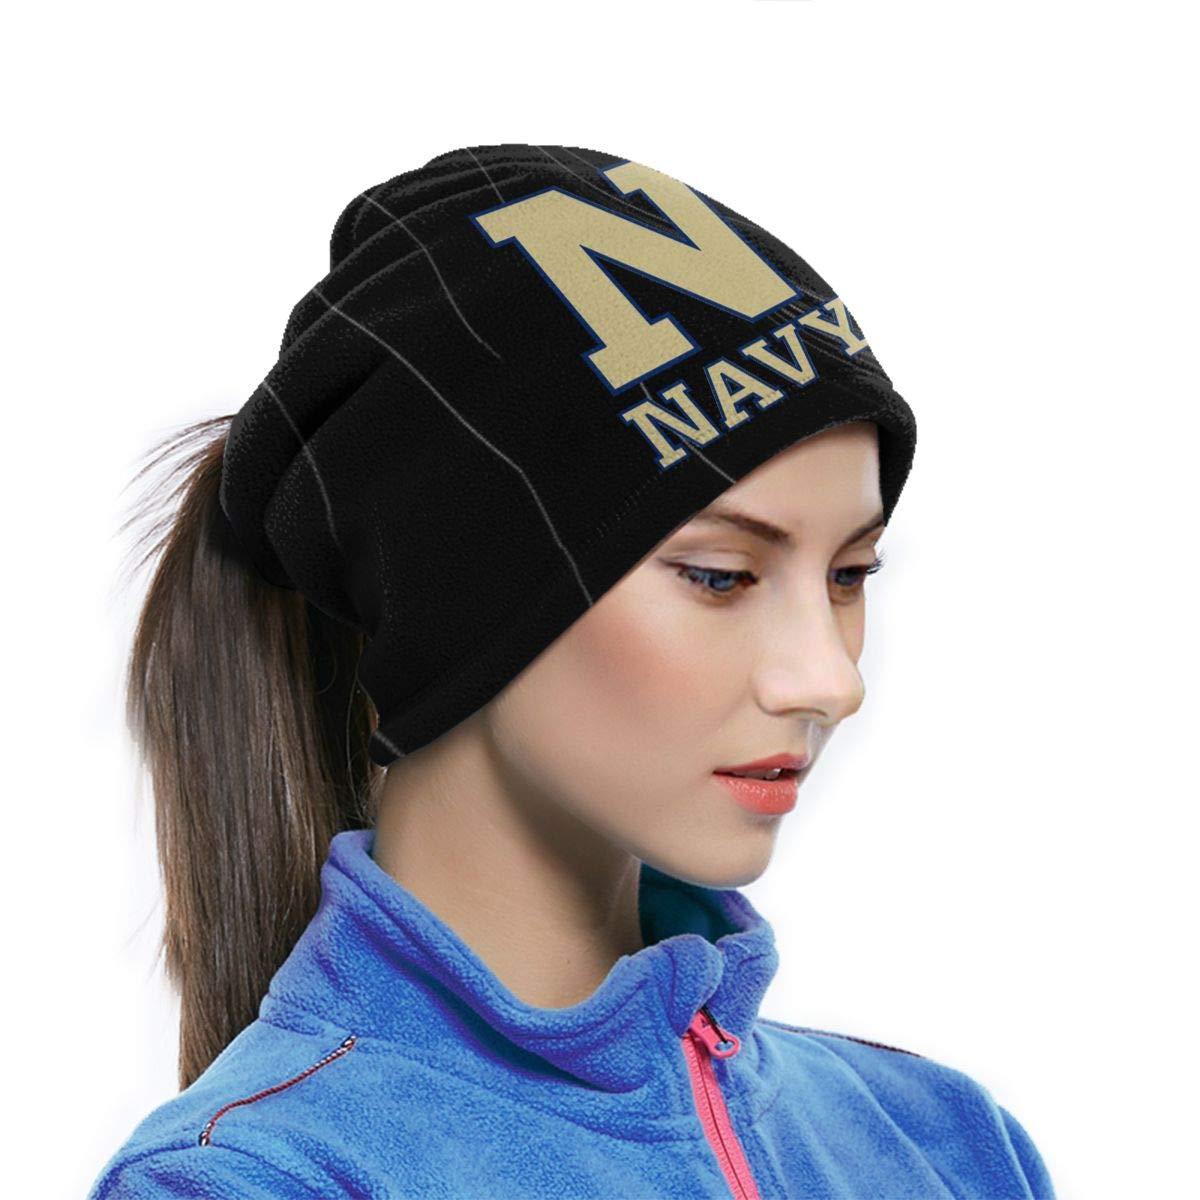 AGGFYEAH Fleece Neck Gaiter Neck Warmer Face Mask Winter Outdoor US Navy Naval Academy